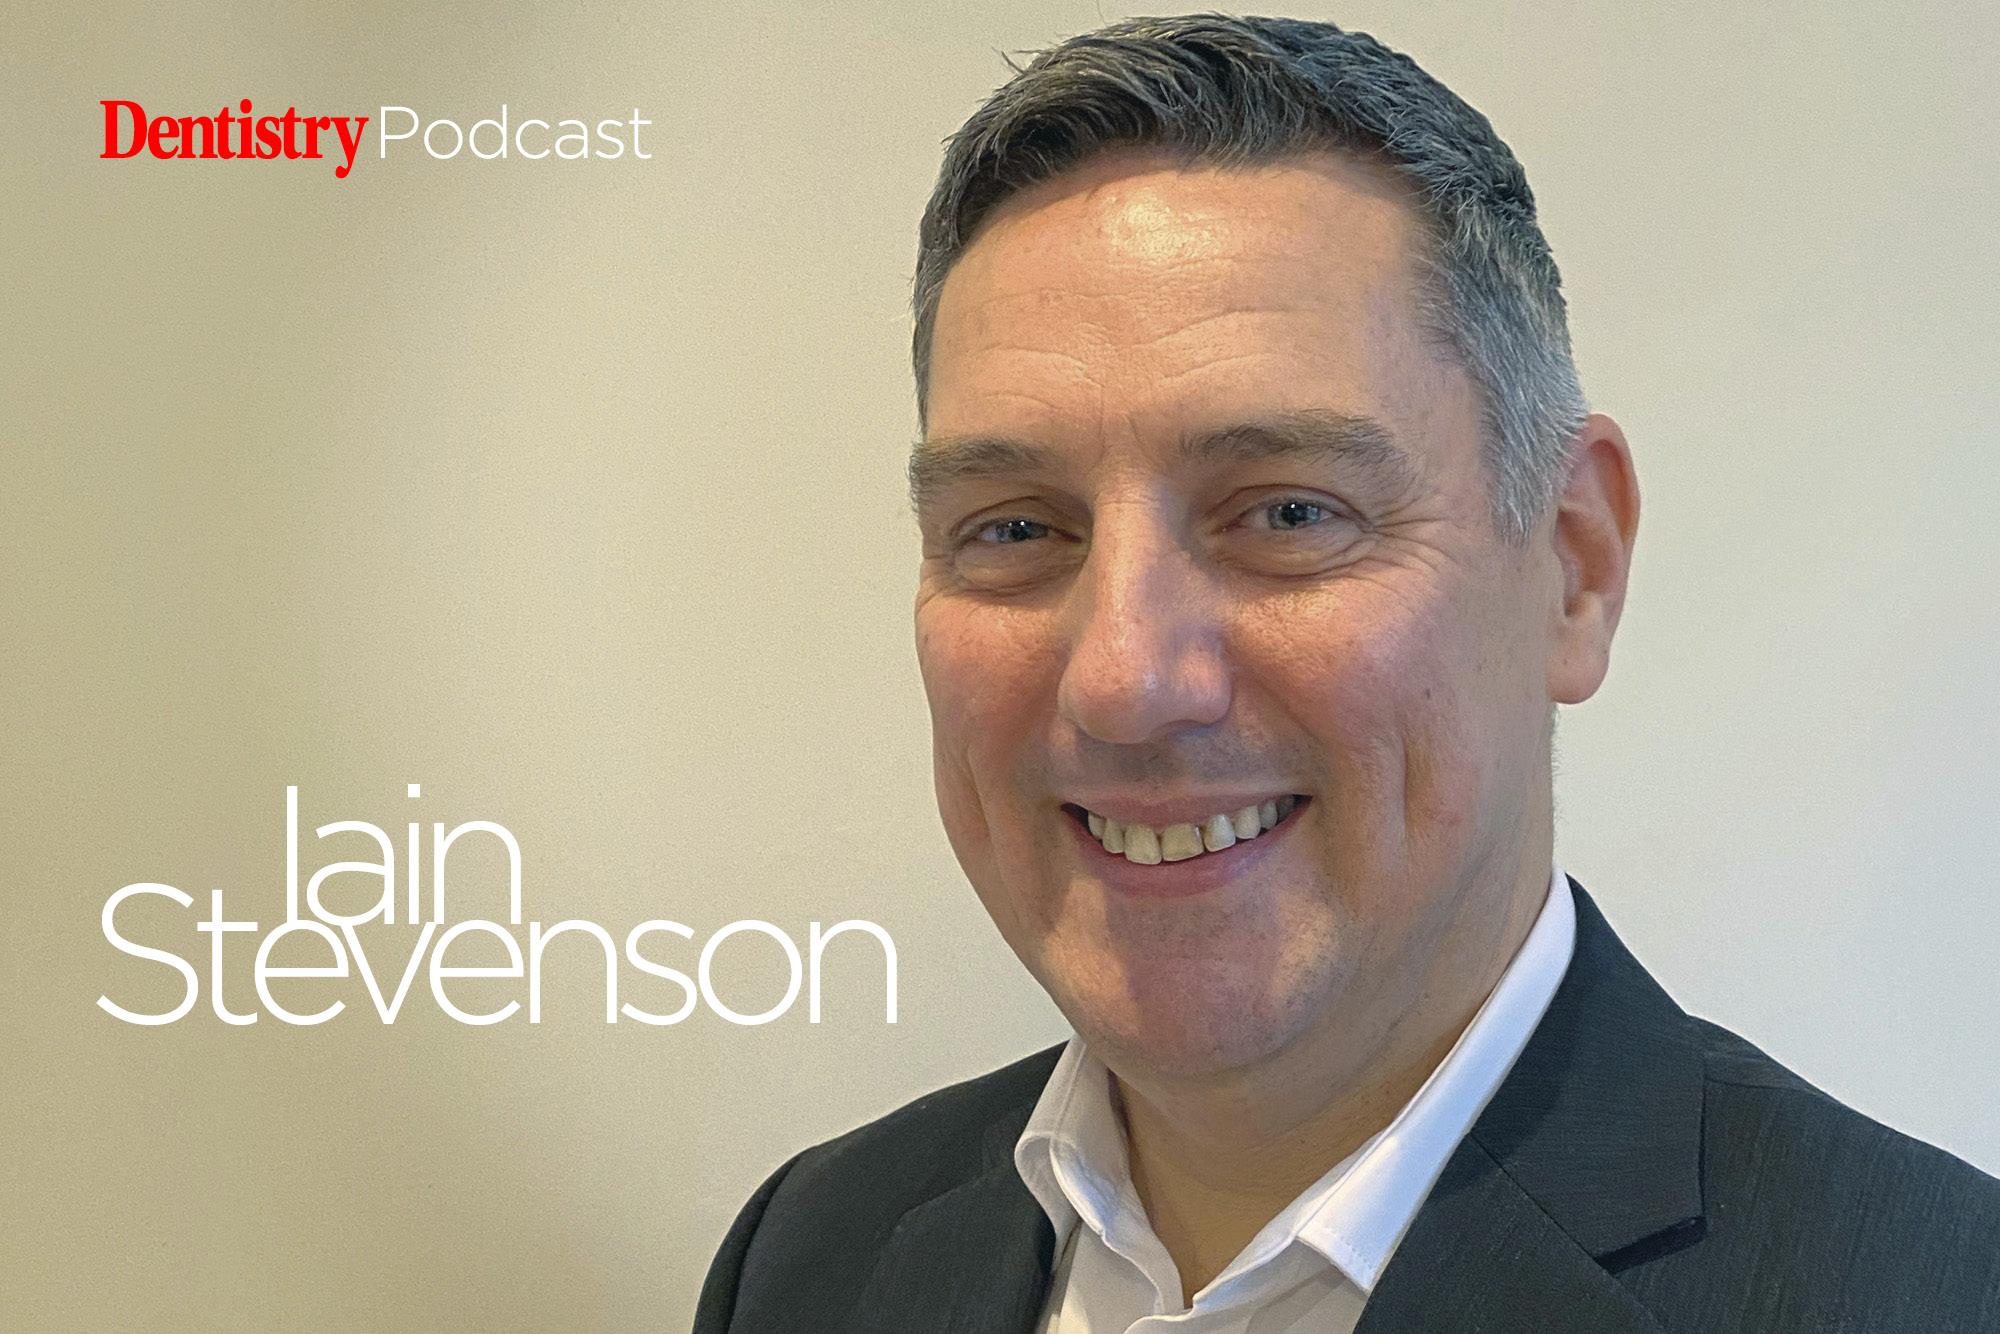 Dentistry Podcast – Iain Stevenson